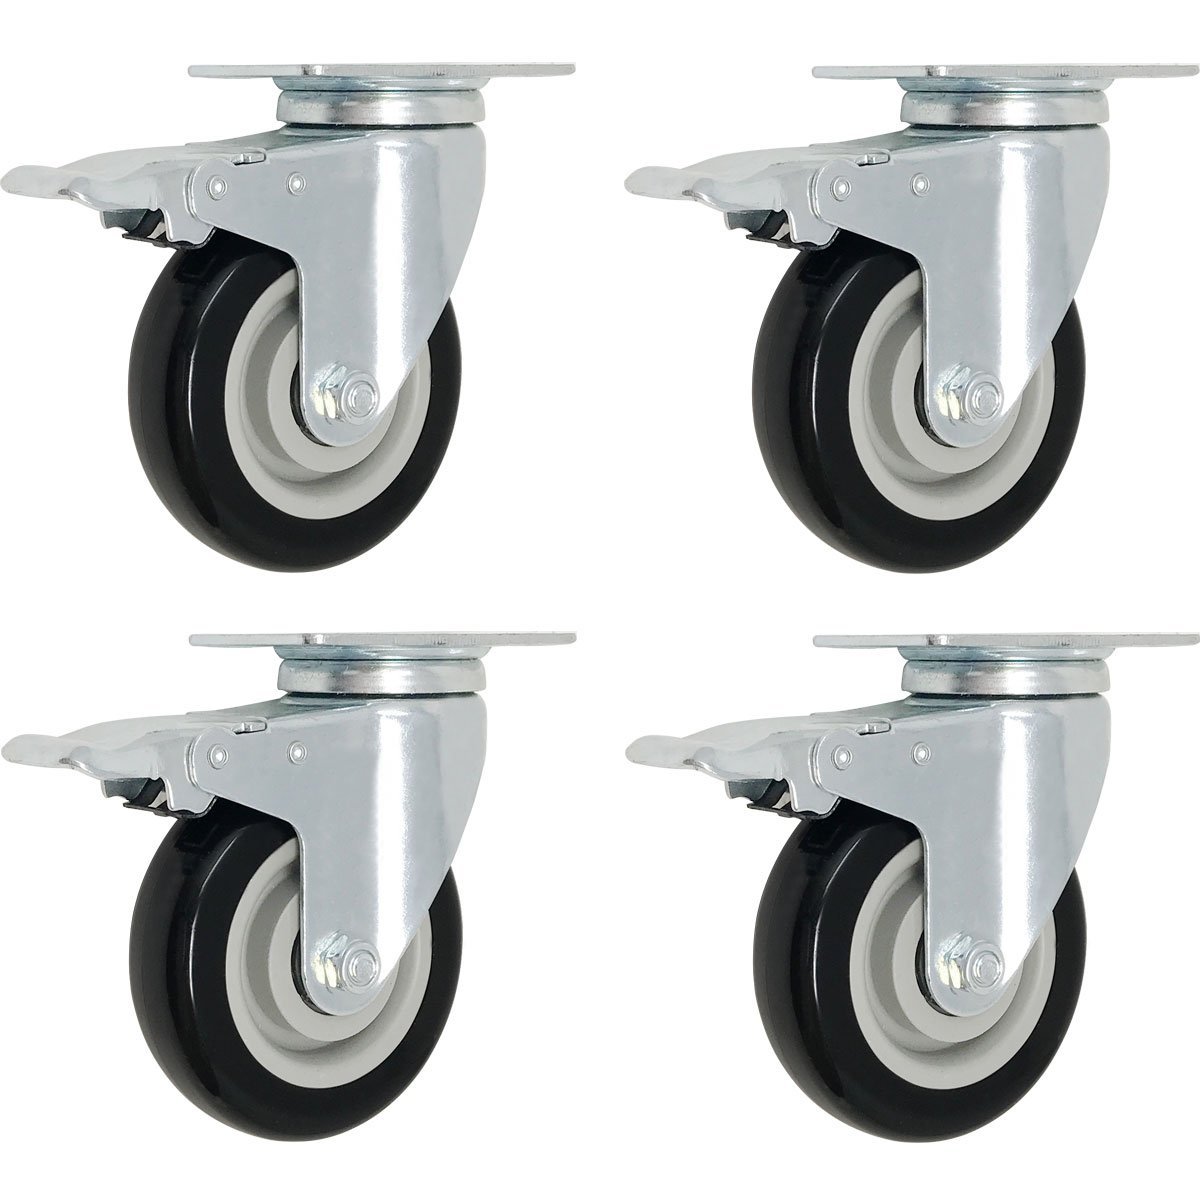 4 Pack Caster Wheels Swivel Plate Stem Brake Casters On Black Polyurethane Wheels 880 Lbs (4 inch with Brake)